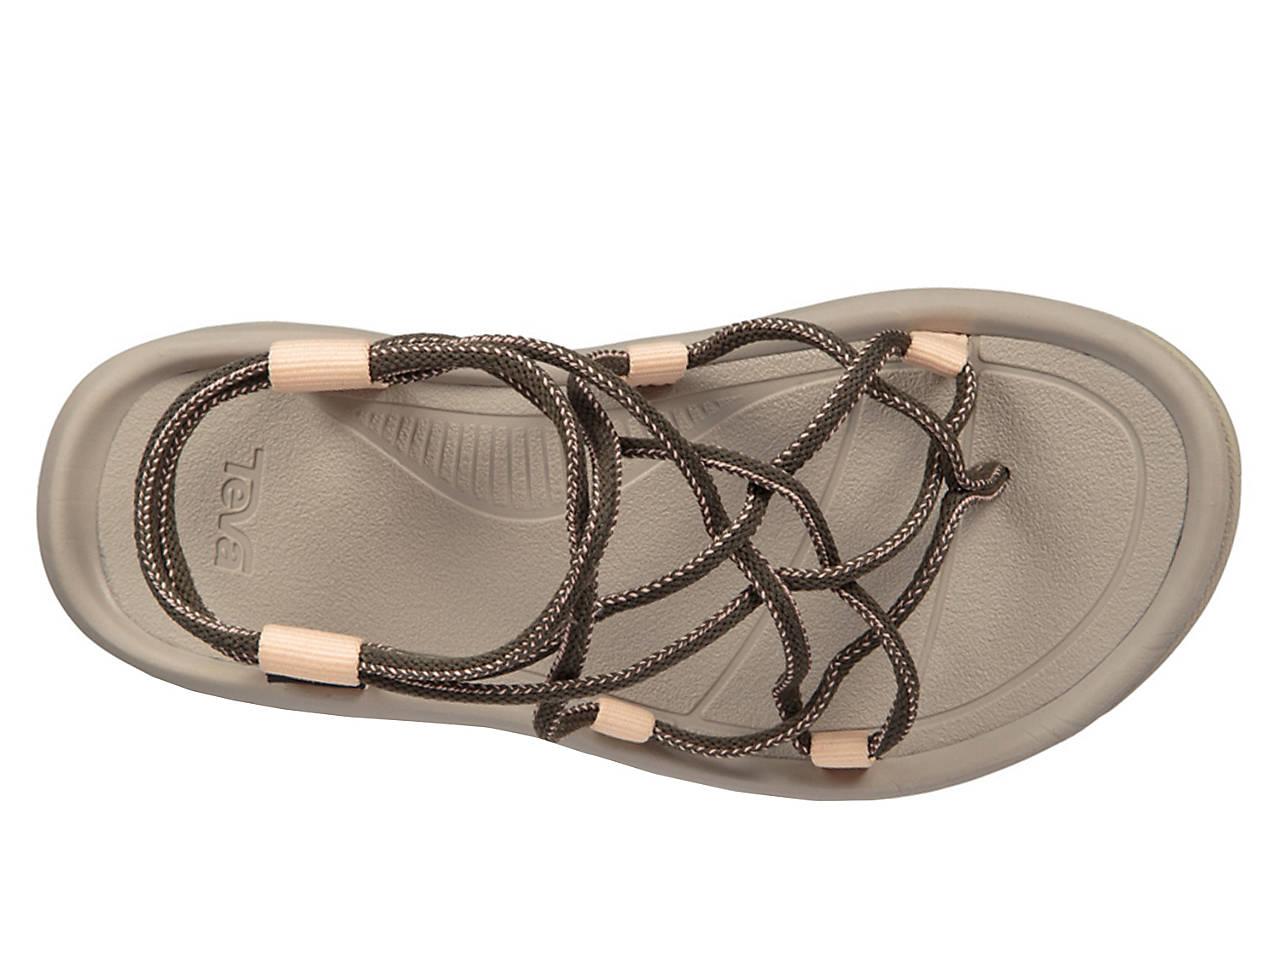 56eda1430829 Teva Hurricane XLT Infinity Sandal Women s Shoes